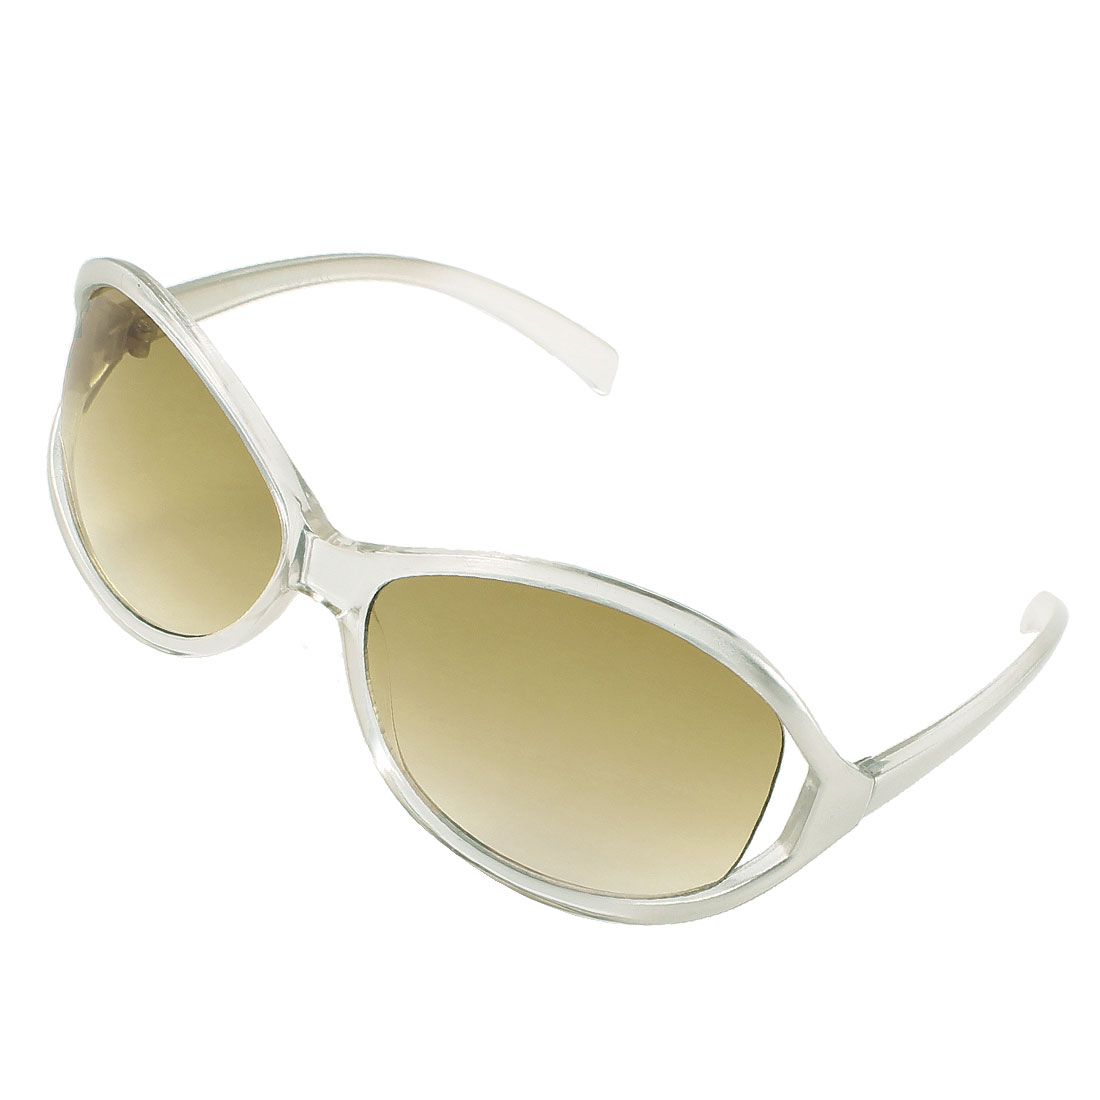 Lady Silver Tone Full Frame Slim Arms Single Bridge Colored Lens Sunglasses